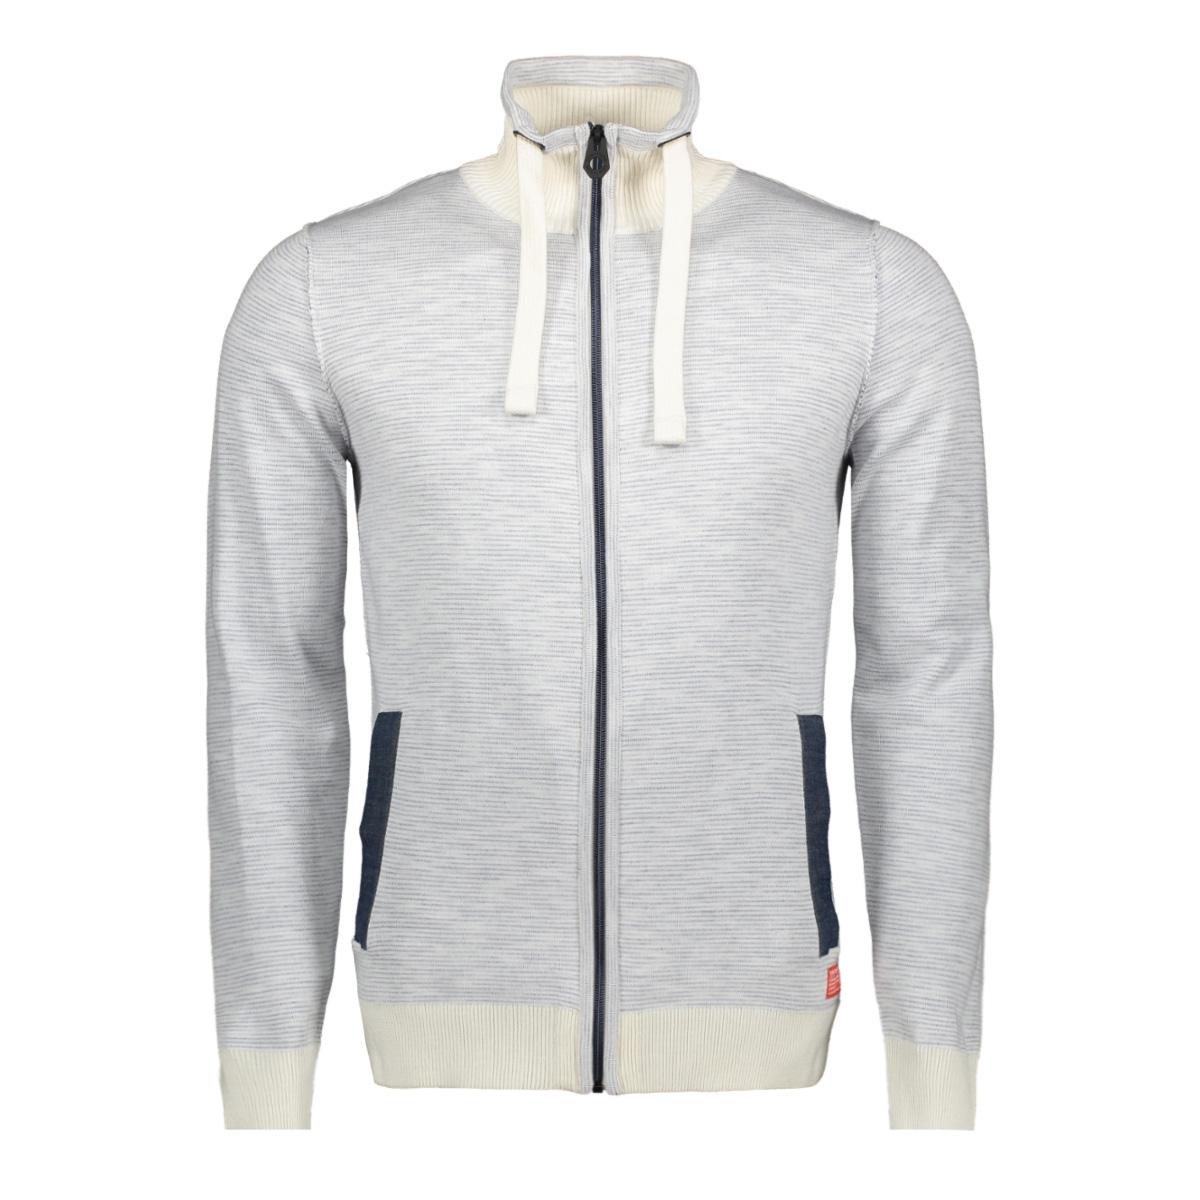 1009612xx10 tom tailor vest 16851